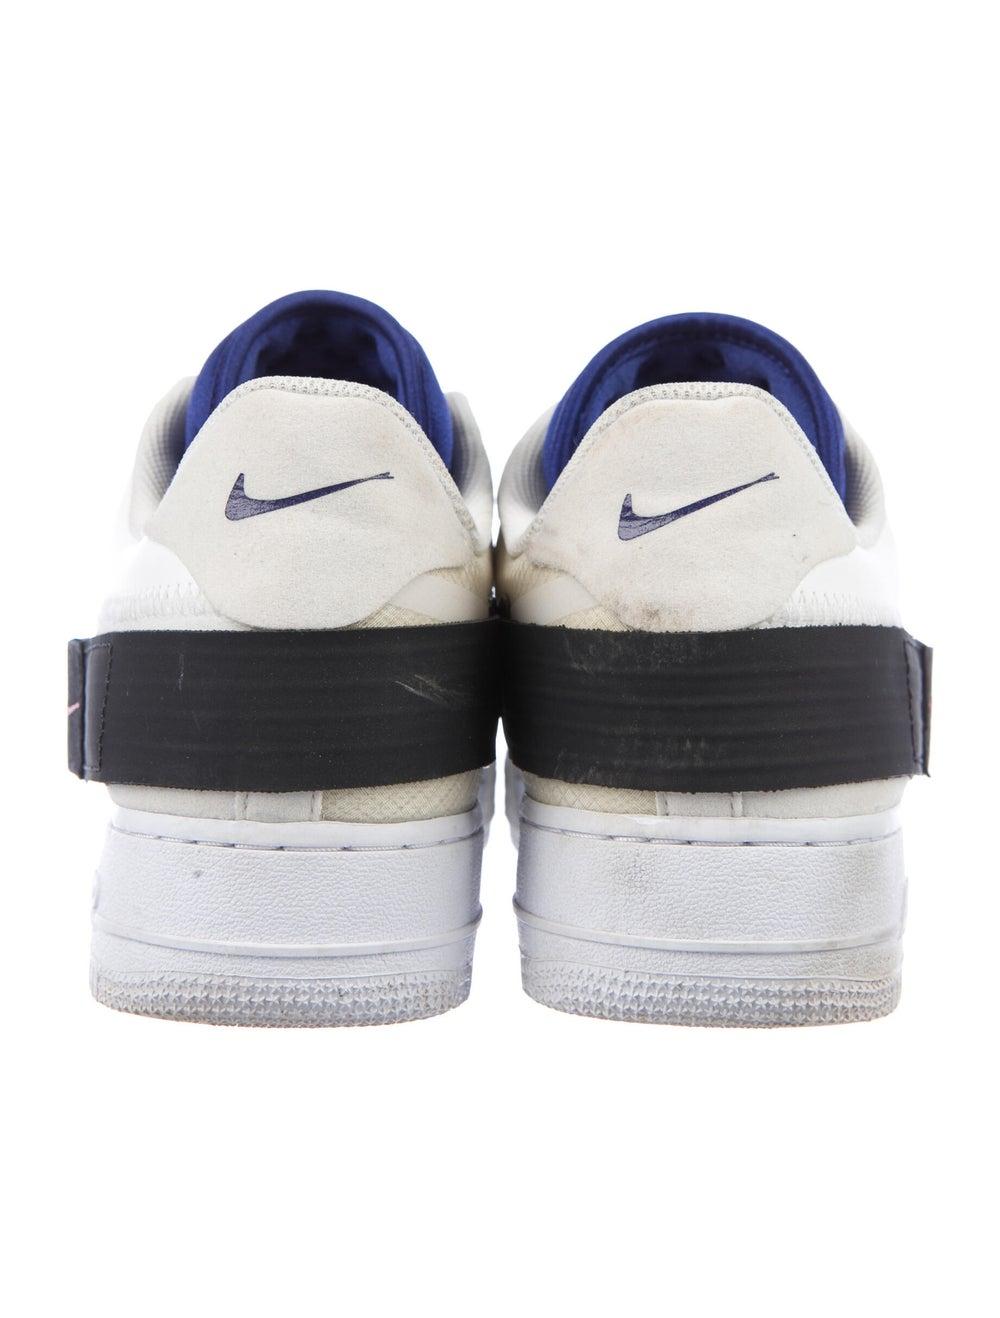 Nike Air Force 1 Type Sneakers - image 4